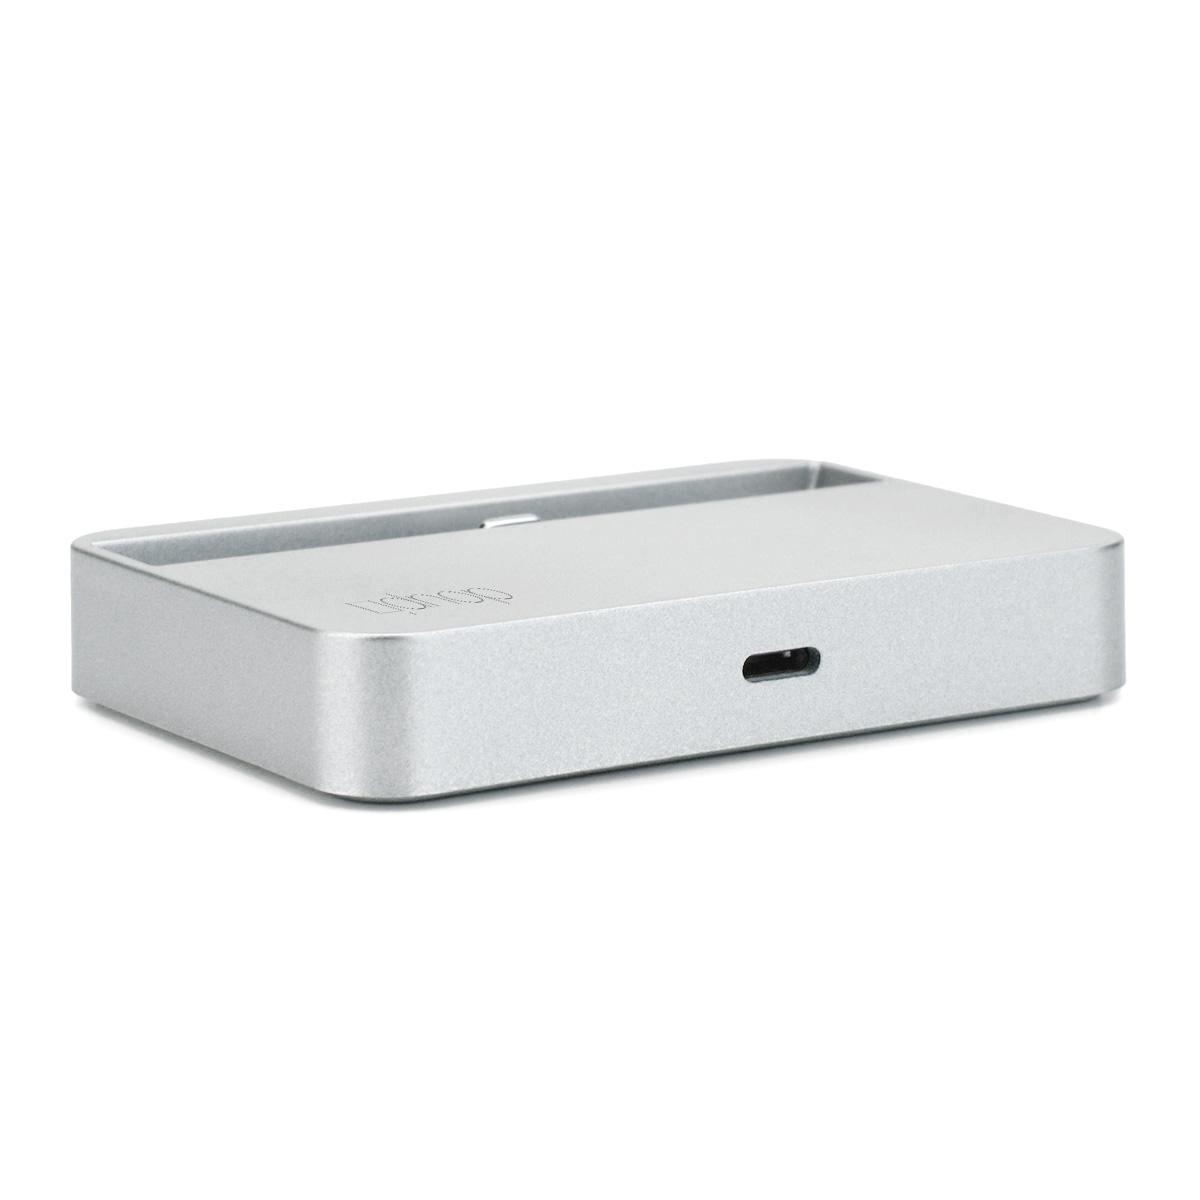 doupi docking station iphone 6 6s 7 plus 5 5c 5s se charging device data sync ebay. Black Bedroom Furniture Sets. Home Design Ideas